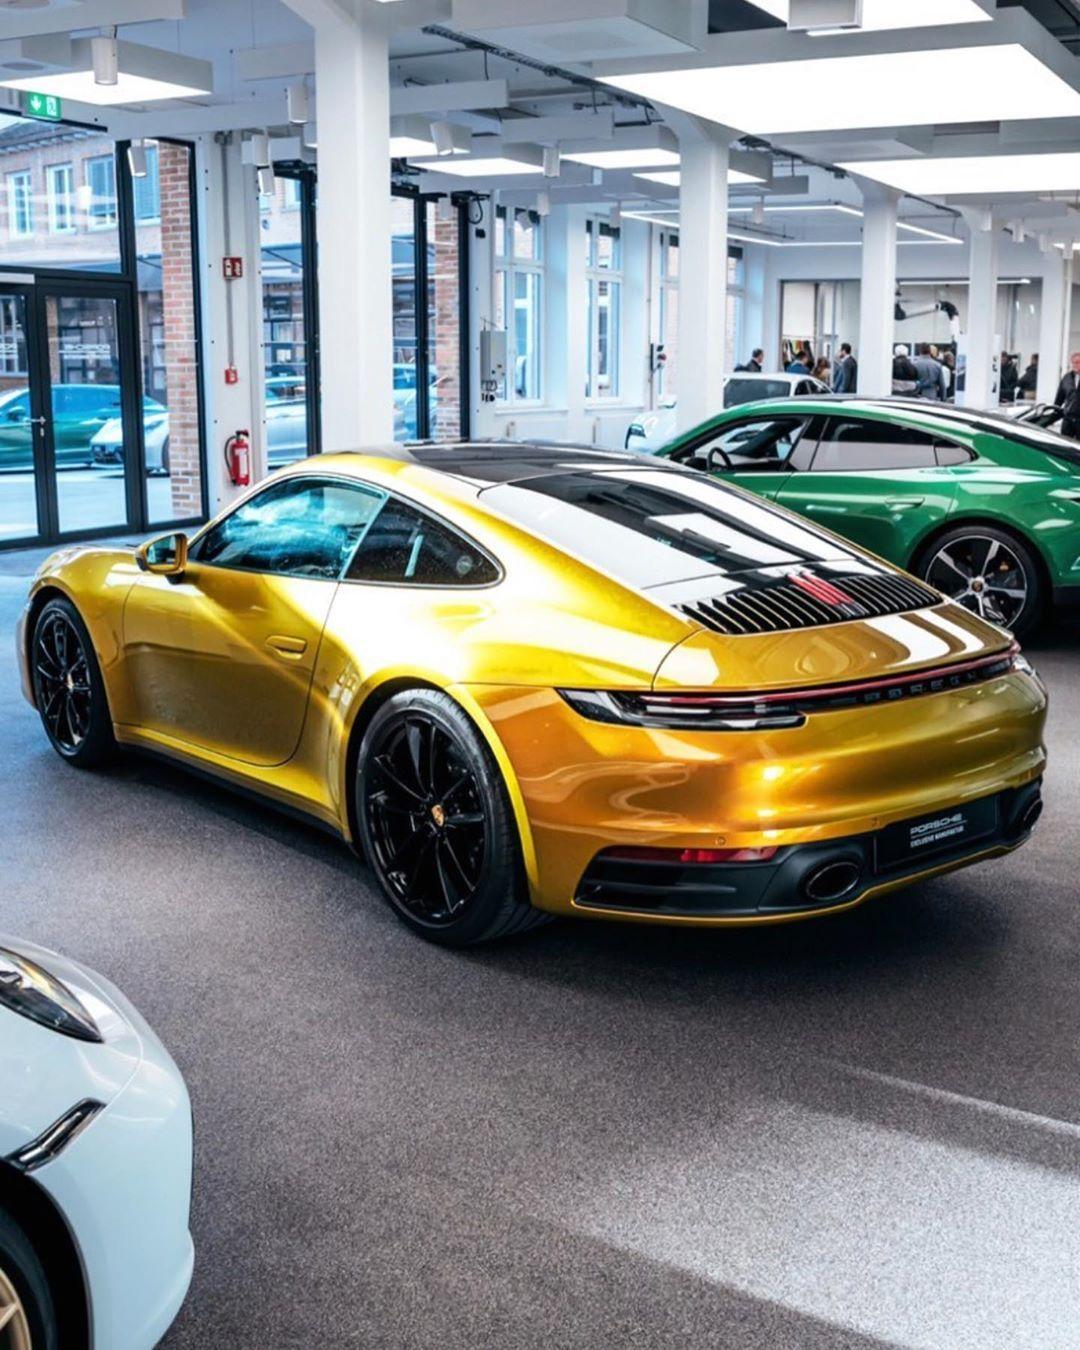 Porsche Porsche Porsche 911 Porsche 911 Turbo